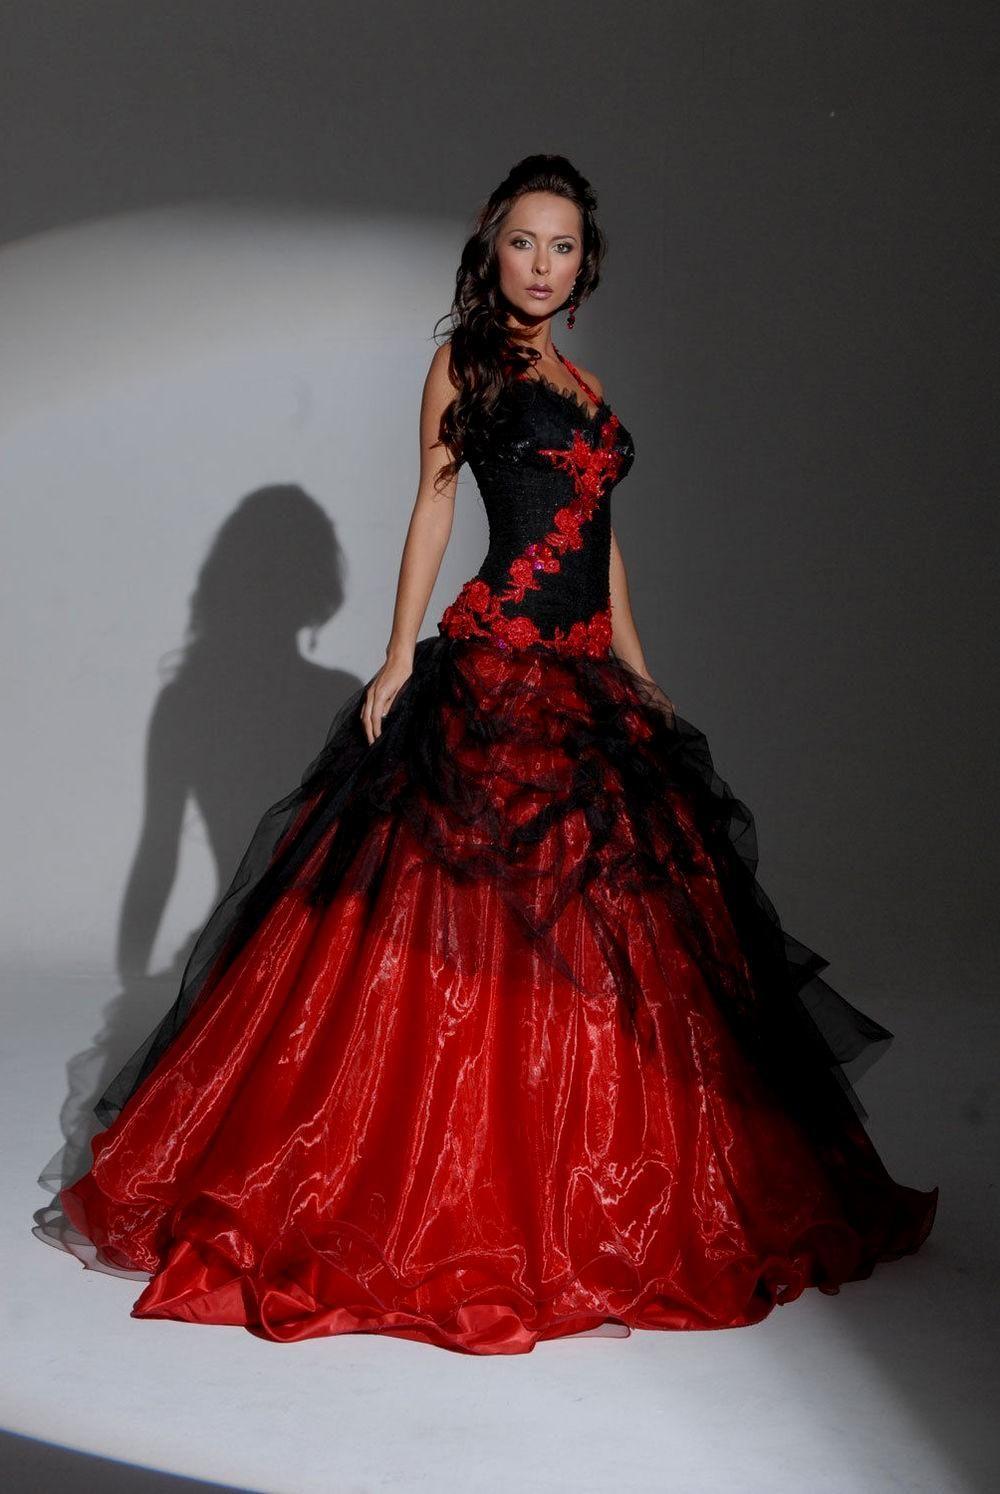 Red Or Black Bridesmaid Dresses